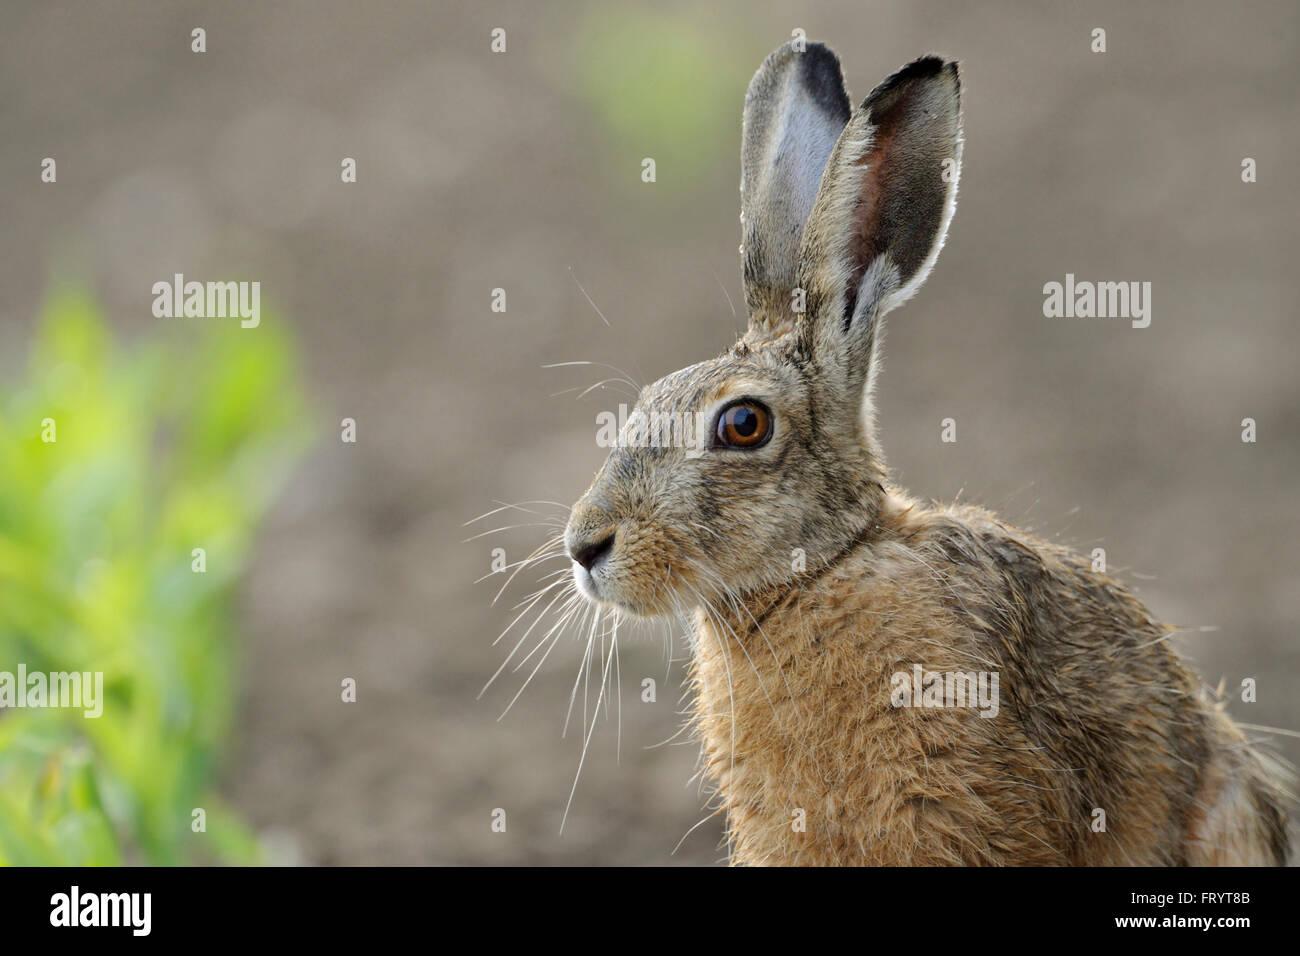 Braune Hare / Europäische Hasen / Feldhase (Lepus Europaeus), großaufnahme, Schuss in den Kopf, sitzt Stockbild